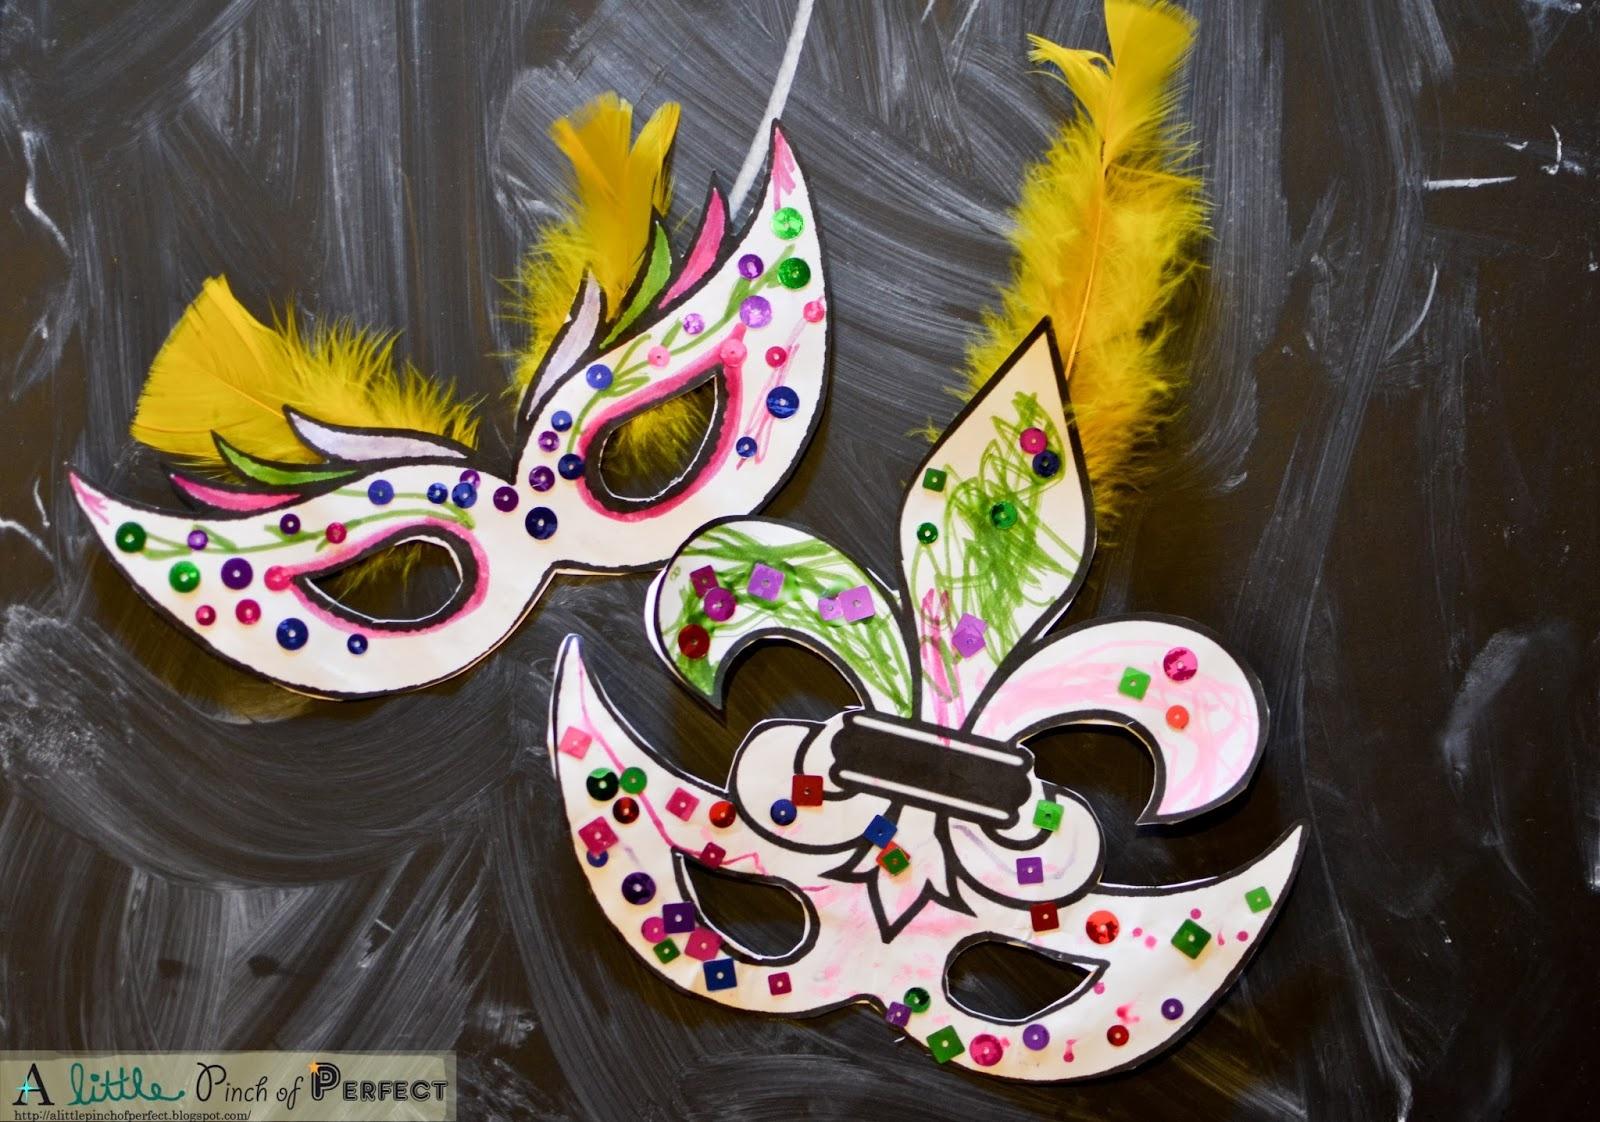 Mardi Gras Masks-Kids Activity (Free Printable With 2 Masks) - - Free Printable Mardi Gras Masks